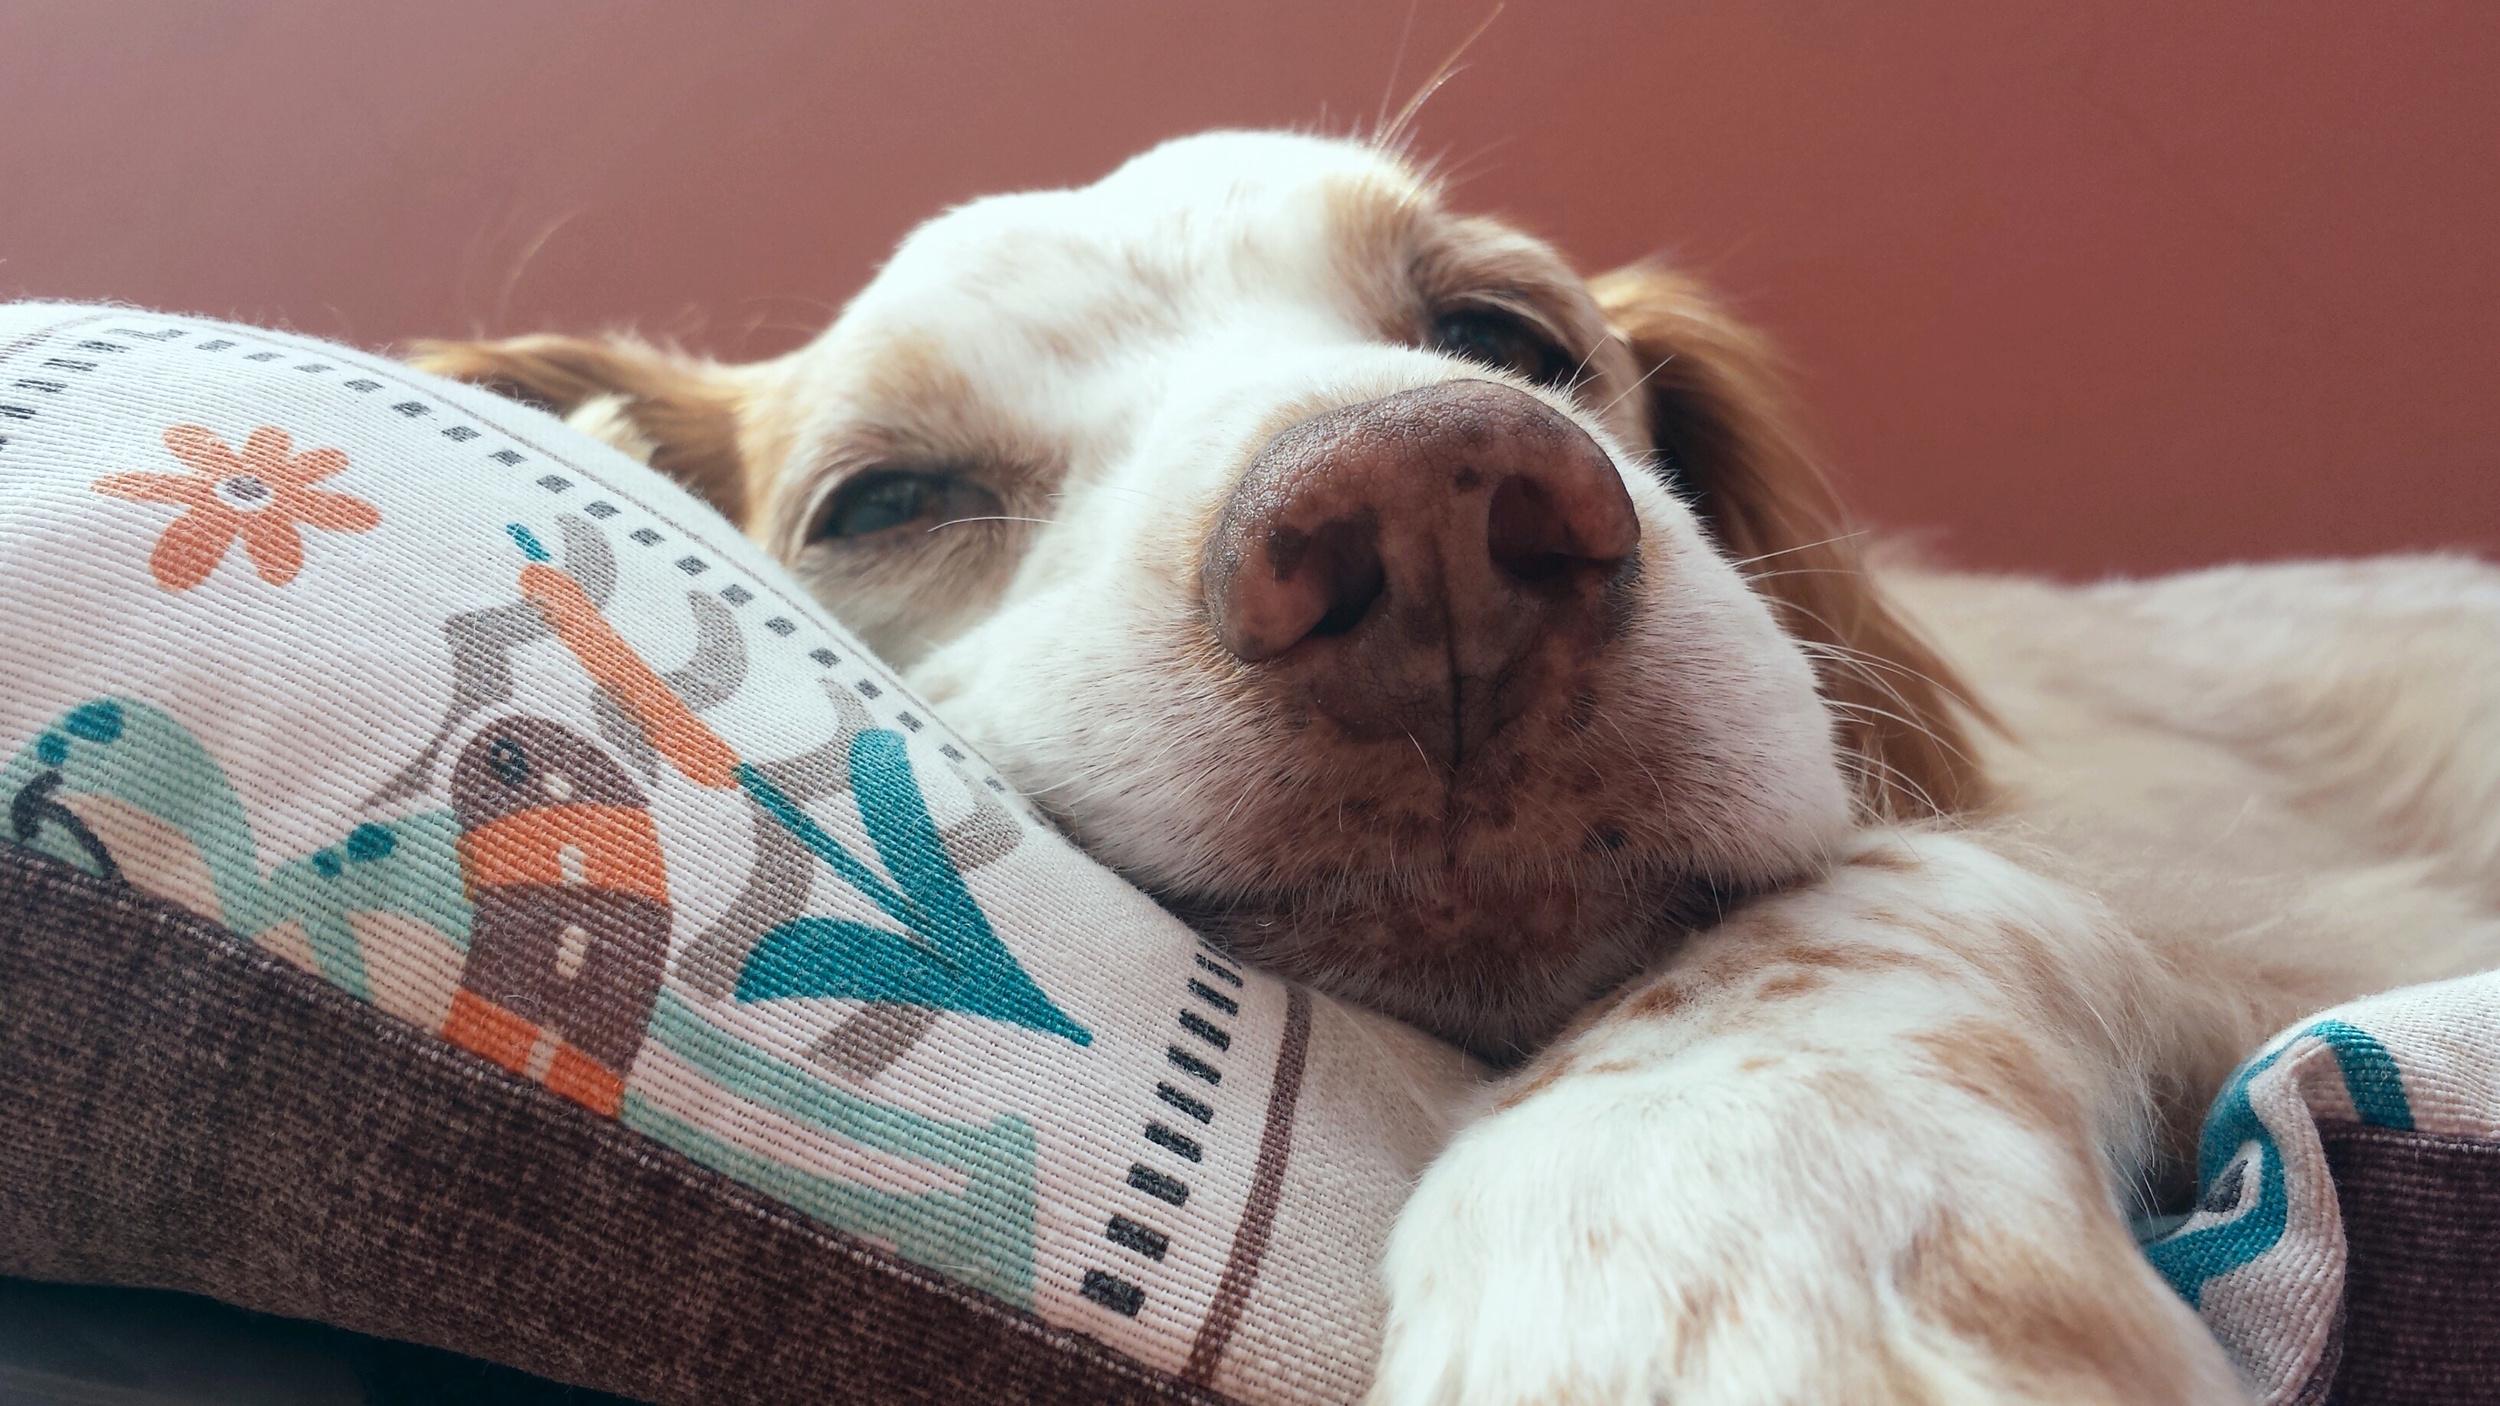 Comfy Heavy Breathing Canine Cancer Osteosarcoma Canine Cancer Dog Nose Bleed After Eating Dog Nose Bleed bark post Dog Nose Bleed